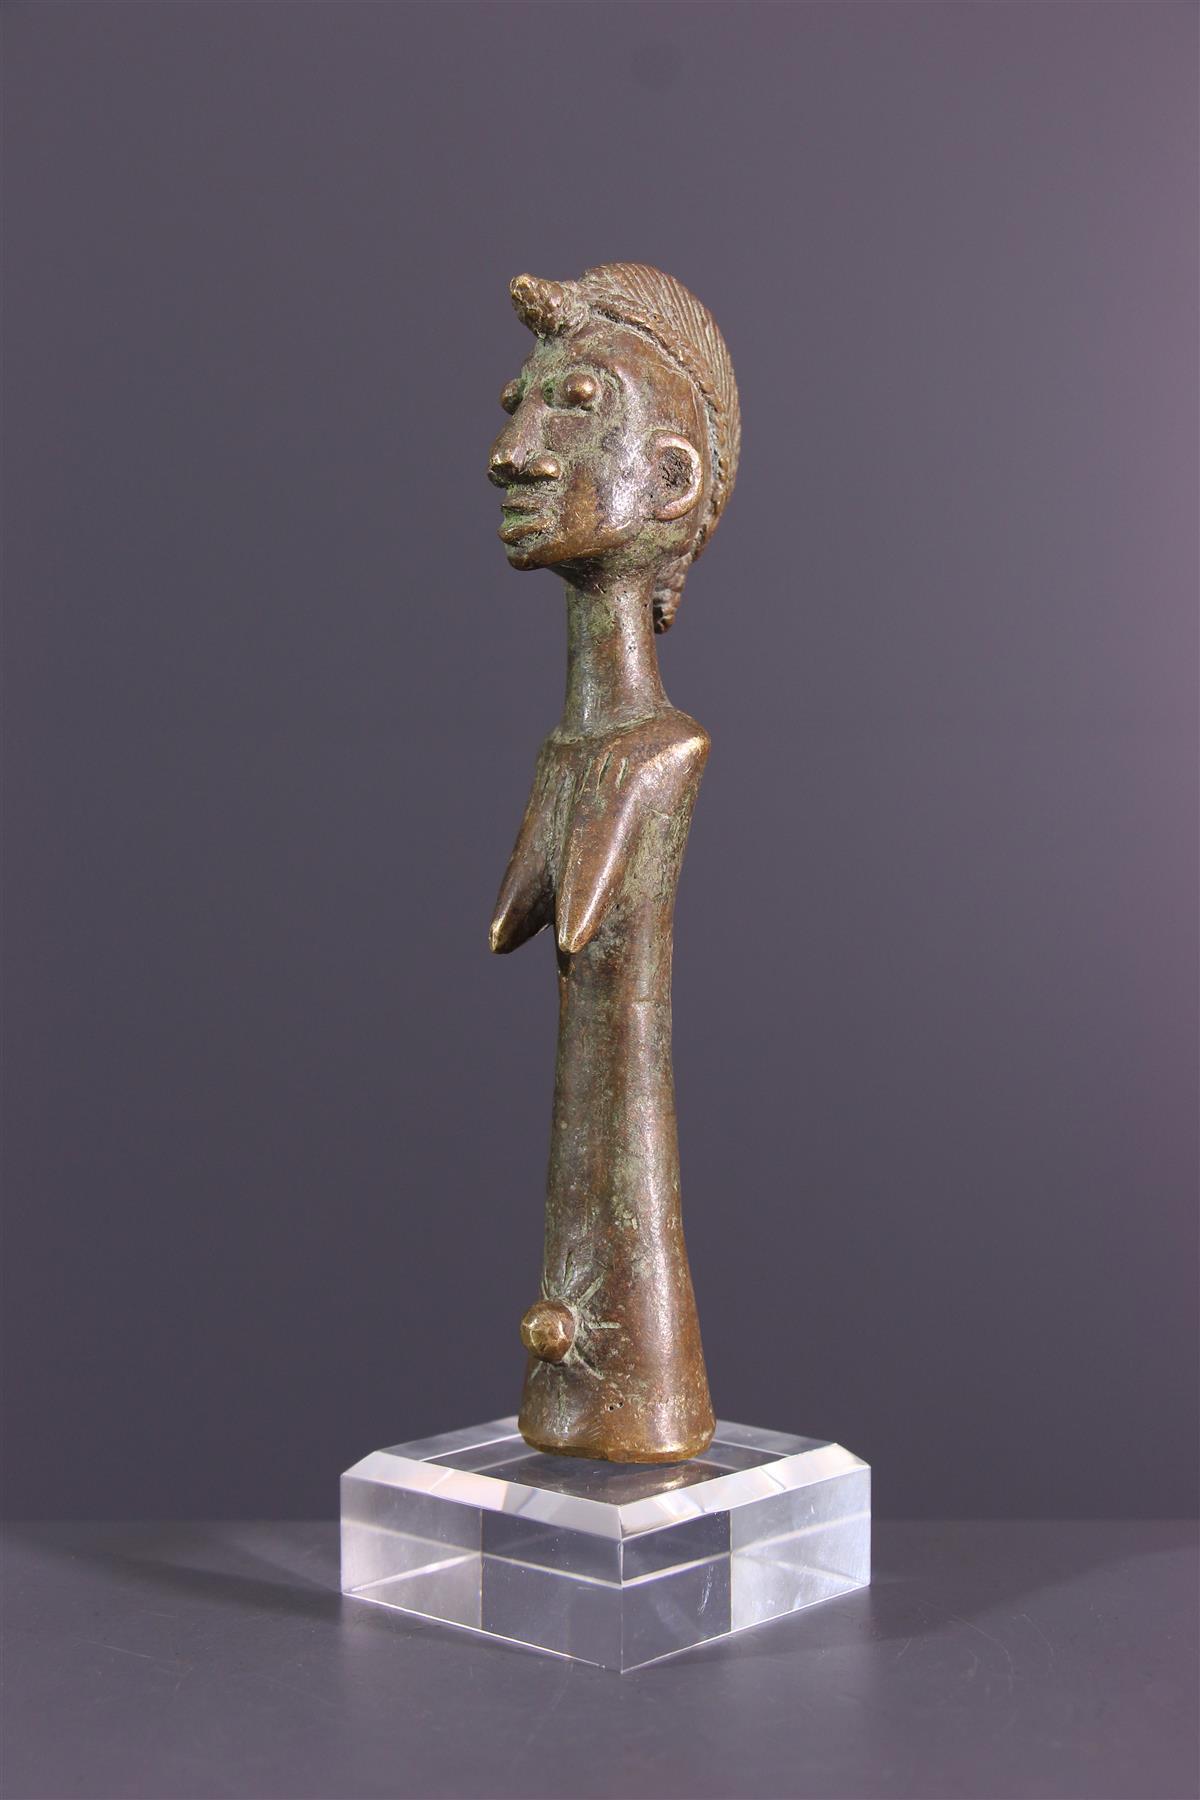 Biga doll - Tribal art